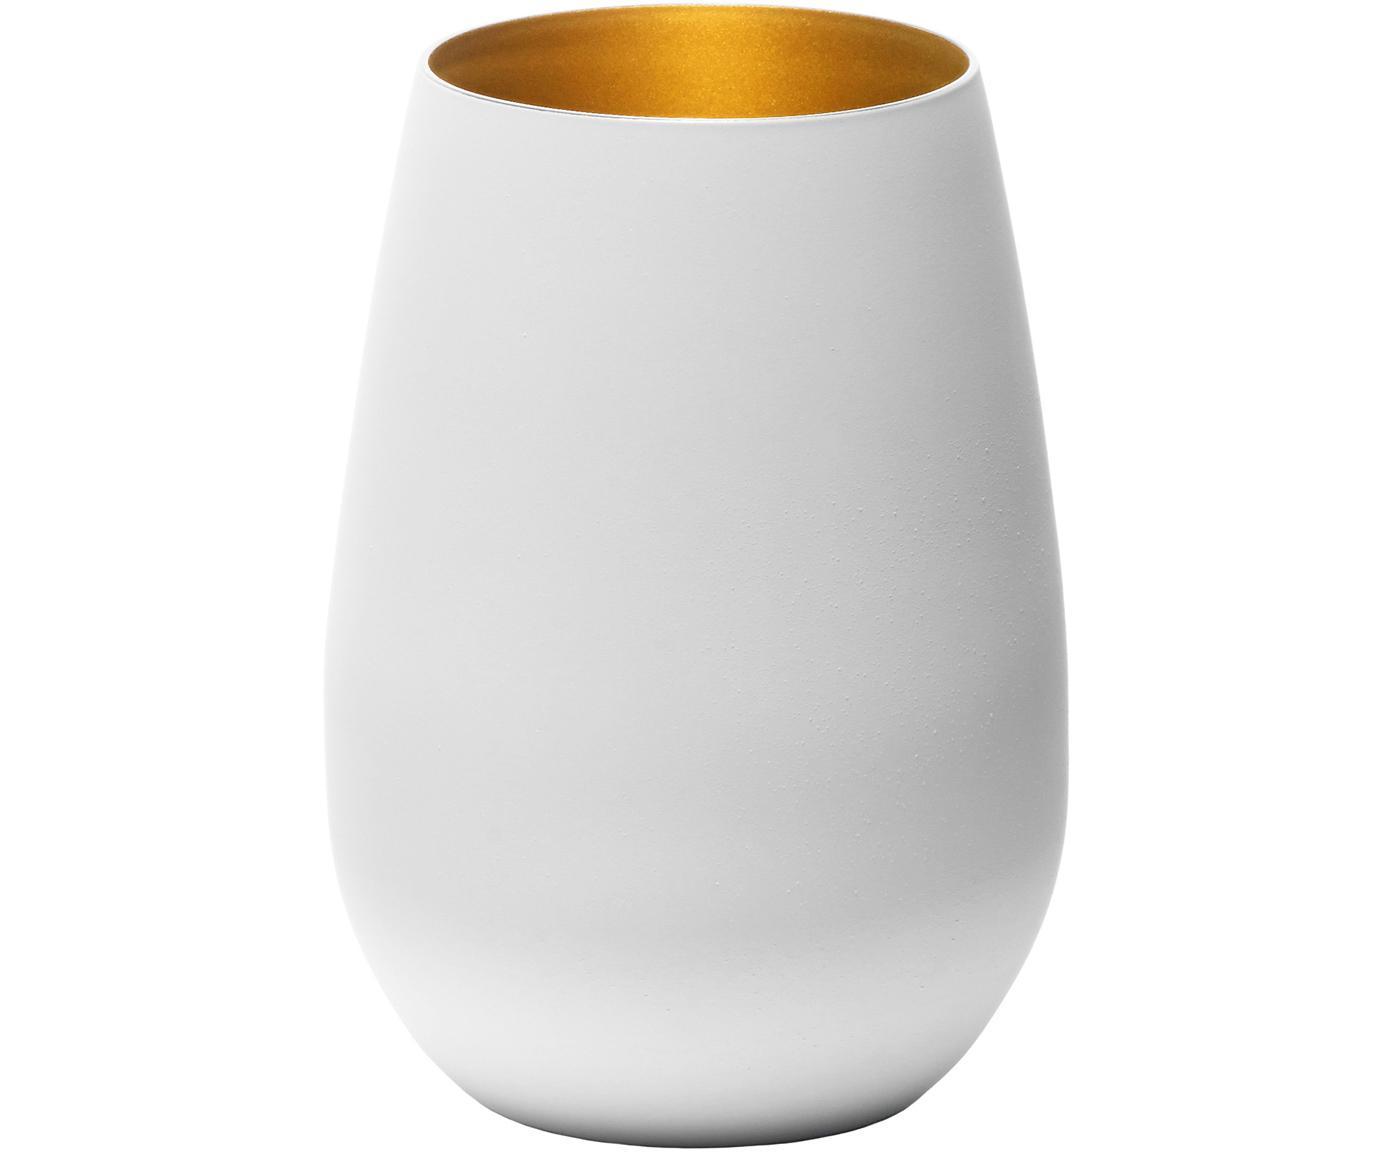 Kristallen longdrinkglazen Elements in wit/goudkleur, 6 stuks, Kristalglas, gecoat, Wit, messingkleurig, Ø 9 x H 12 cm